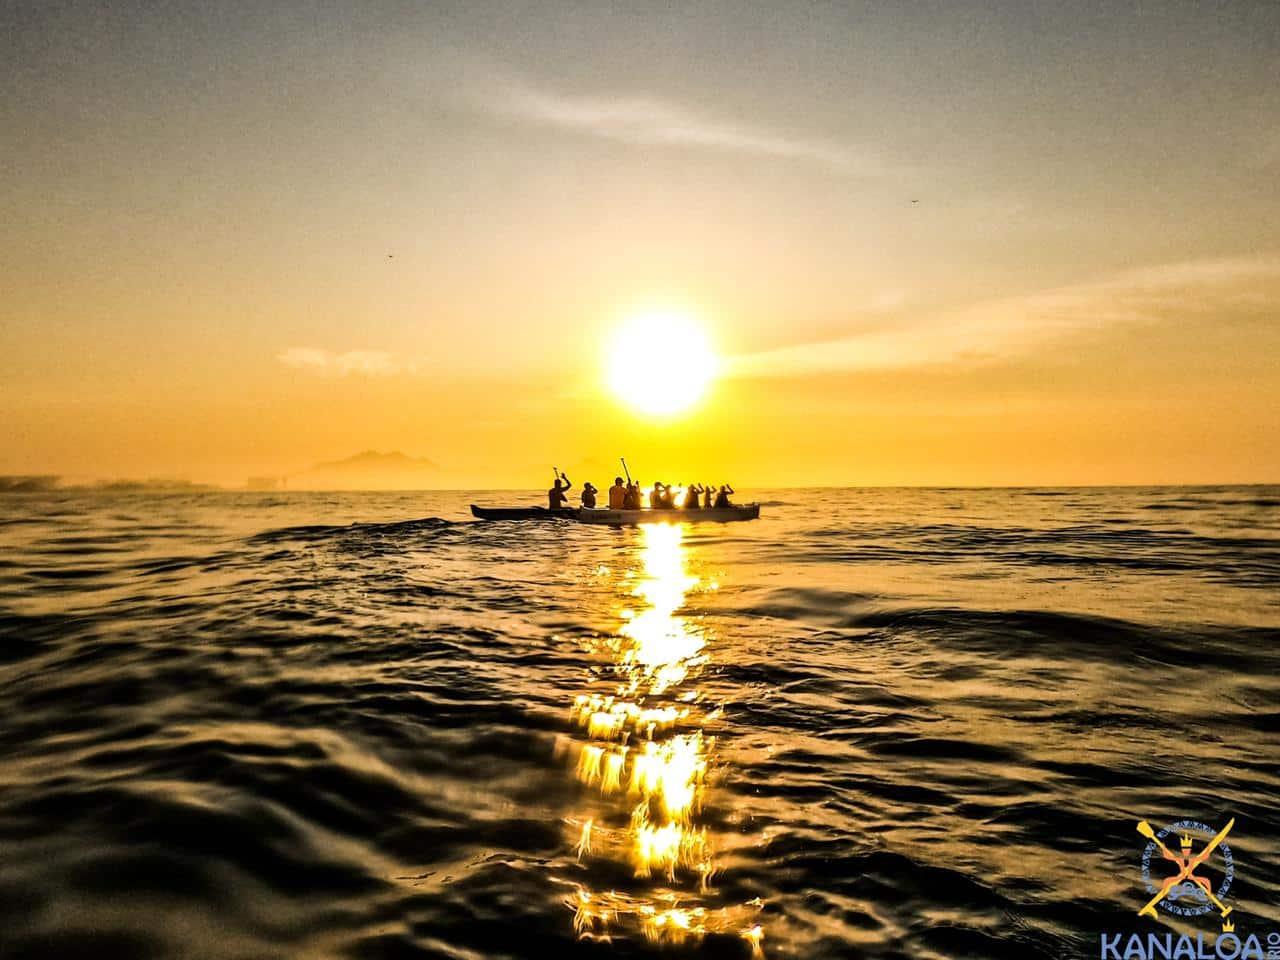 Passeio Turístico de Canoa Havaiana Nascer do Sol